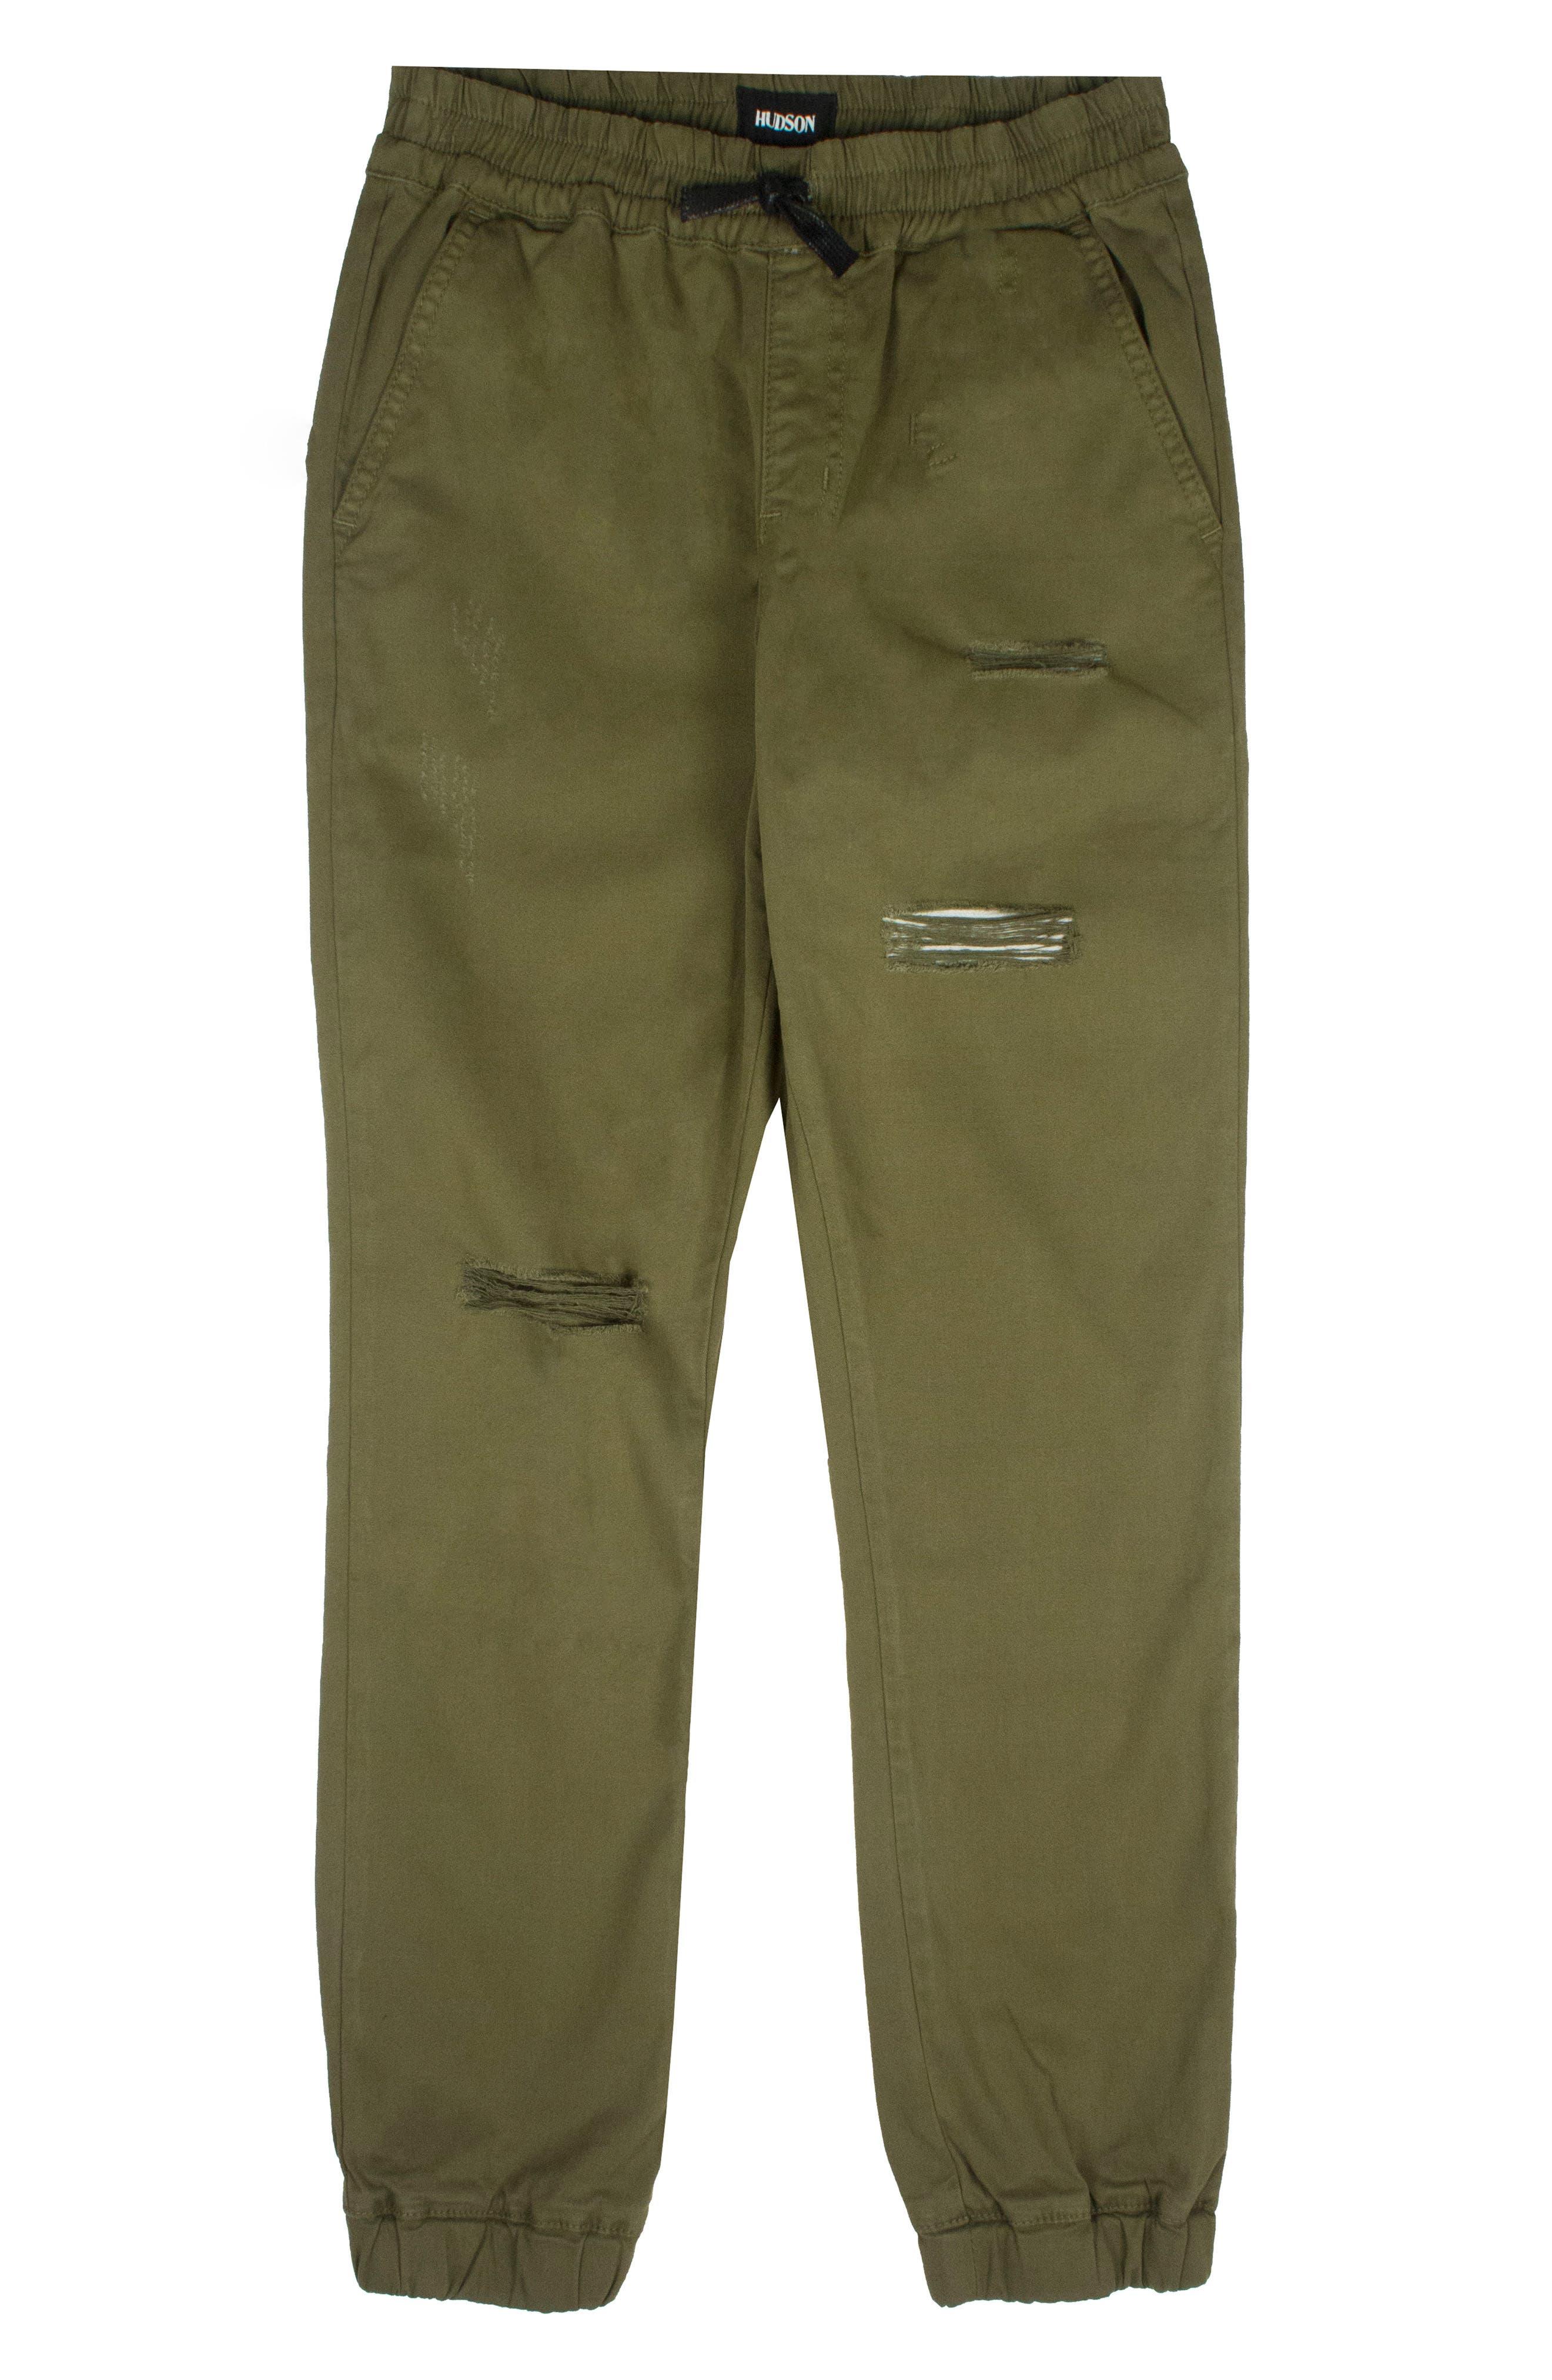 Charlie Jogger Pants,                         Main,                         color, Olive Green